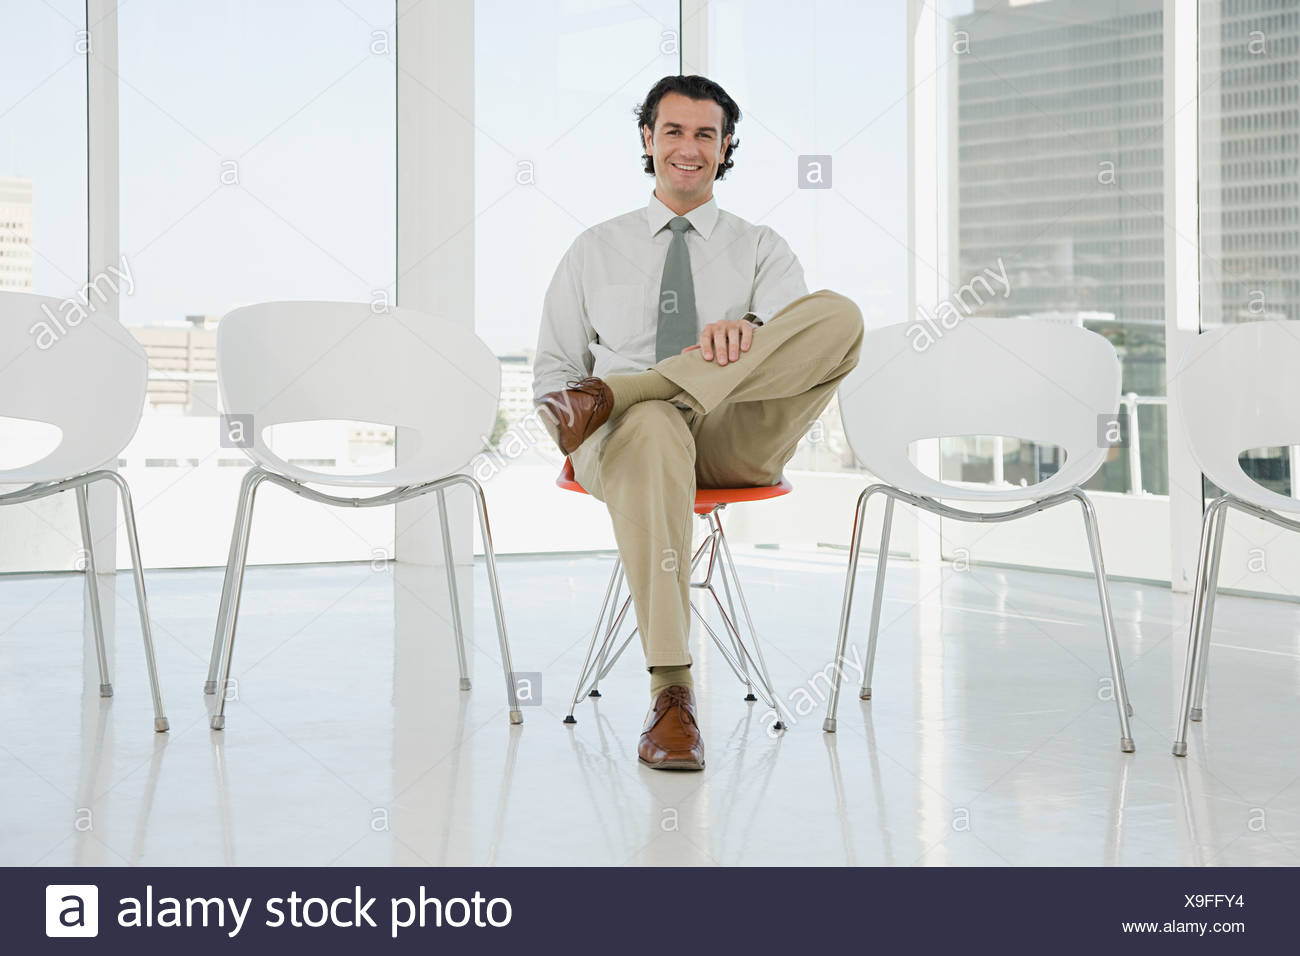 Mann sitzt im Stuhl Stockbild